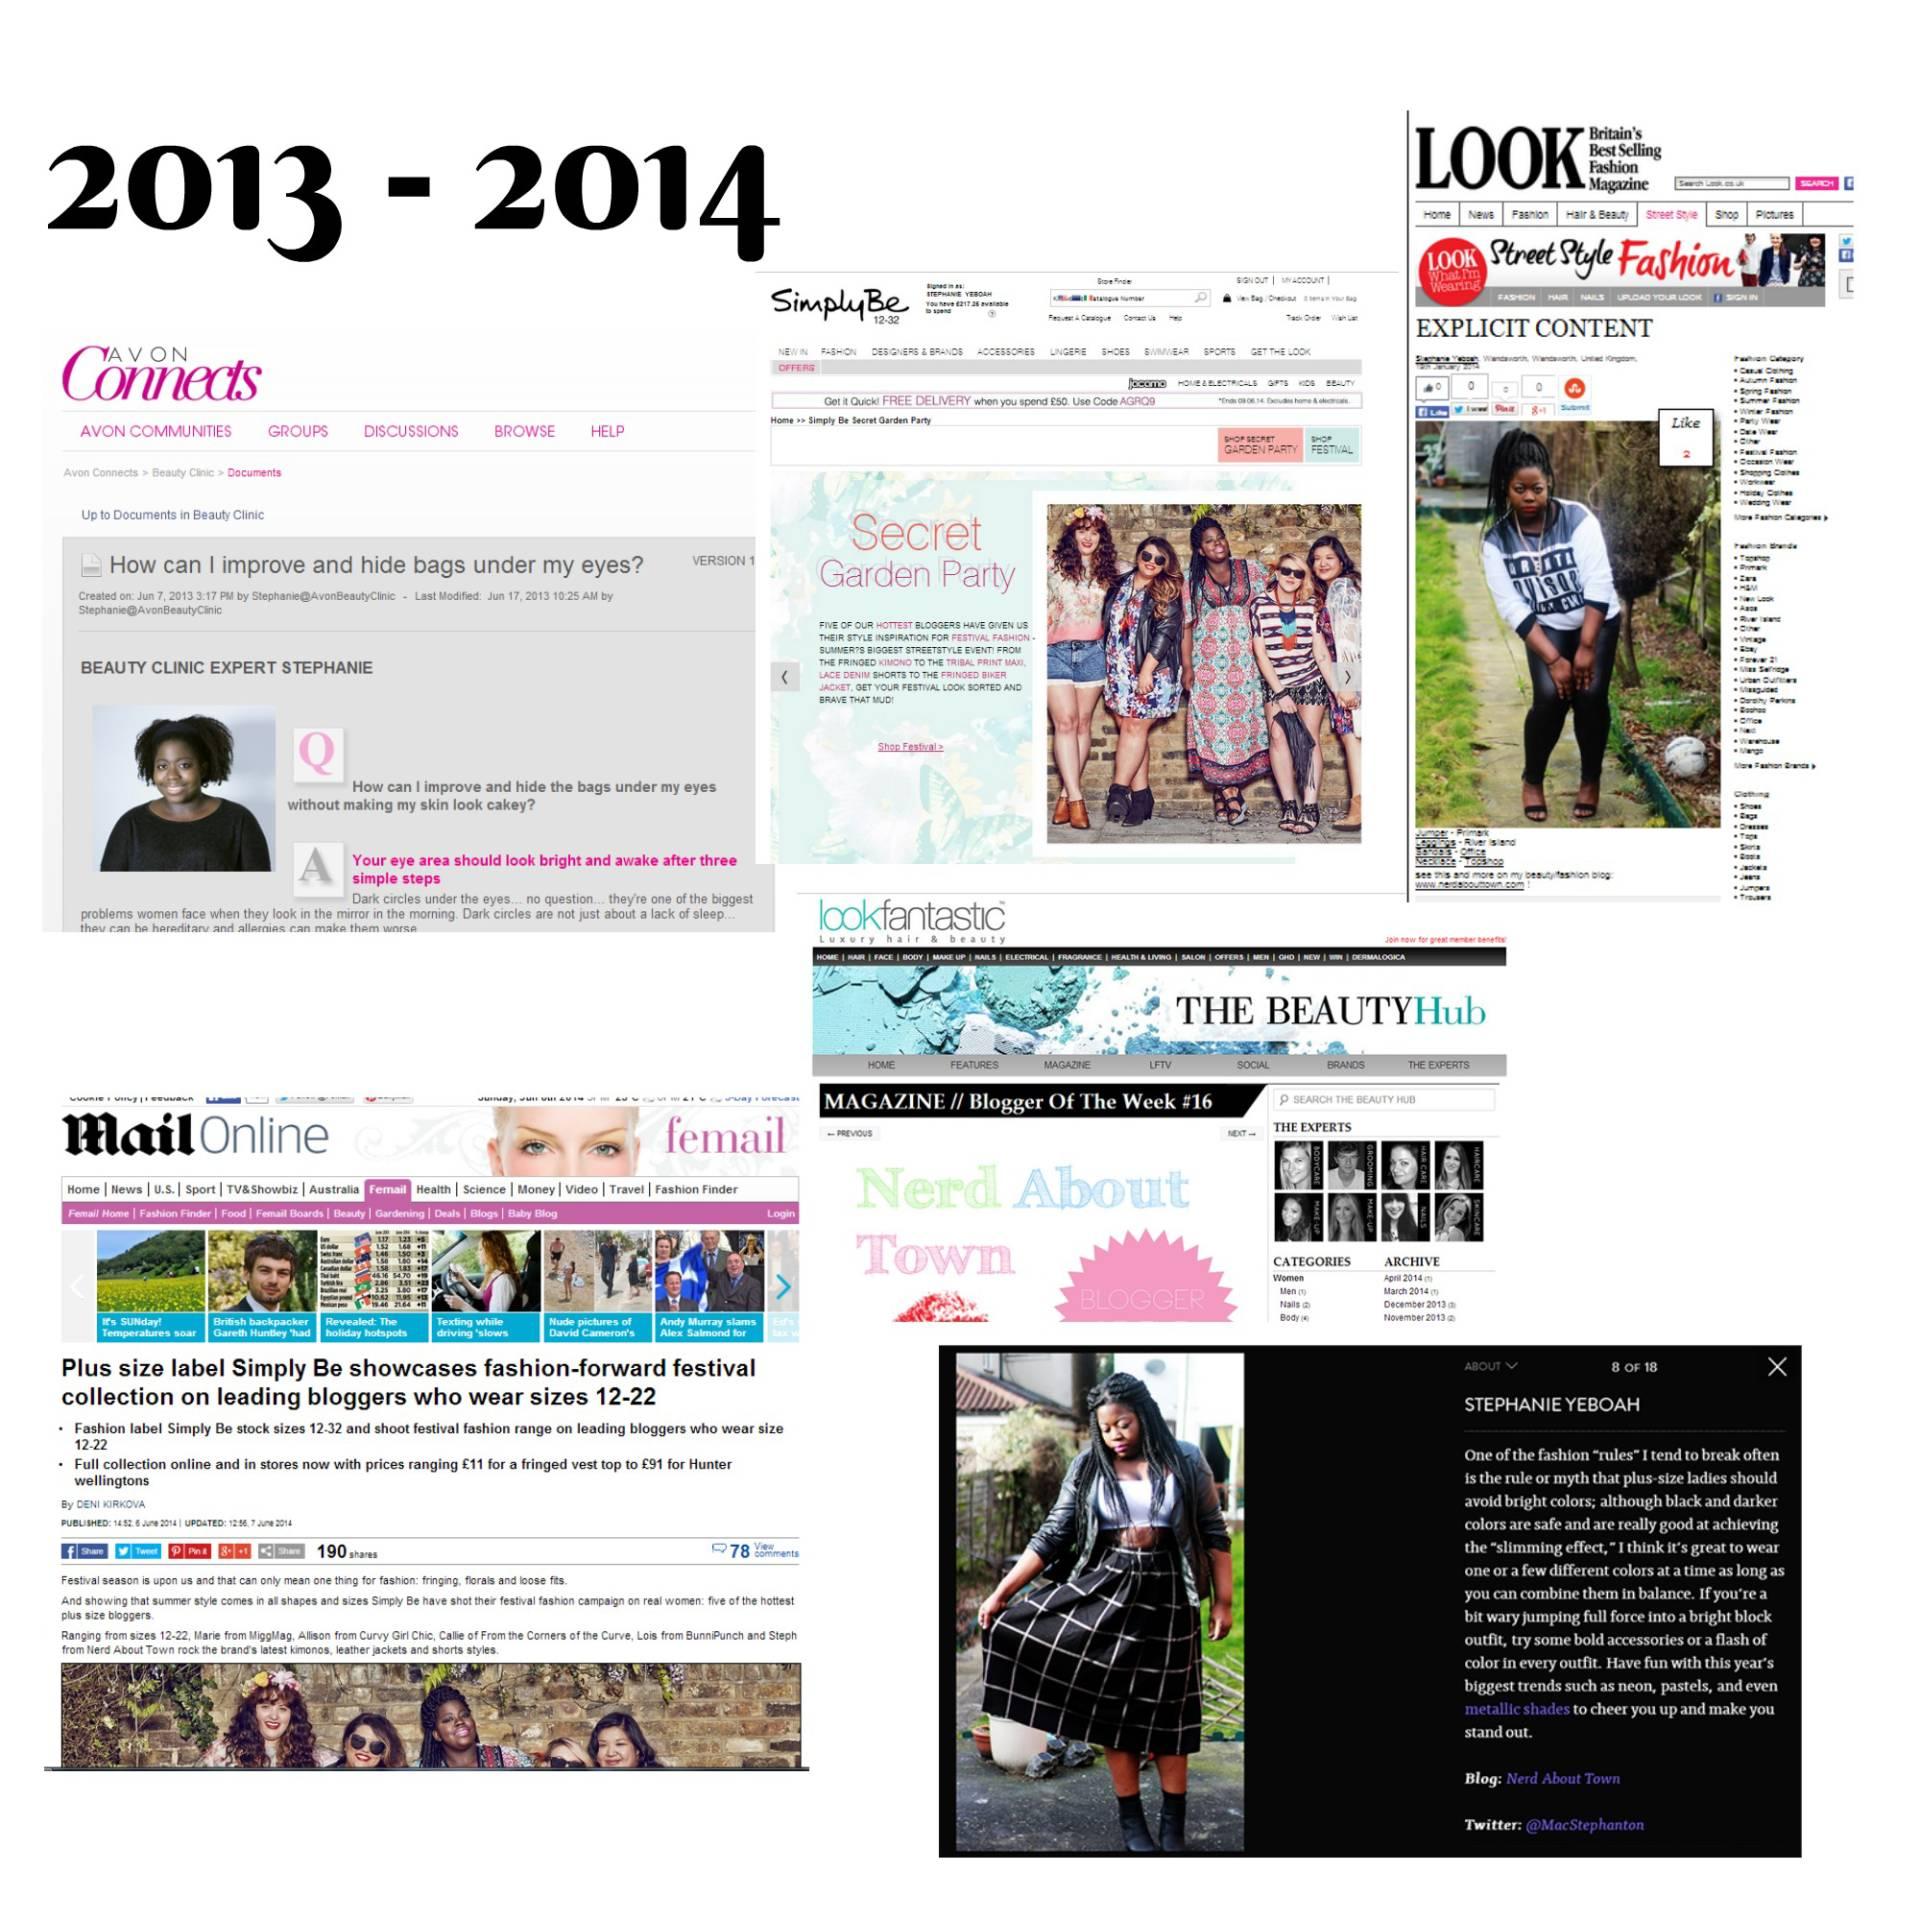 2013 2014 Press